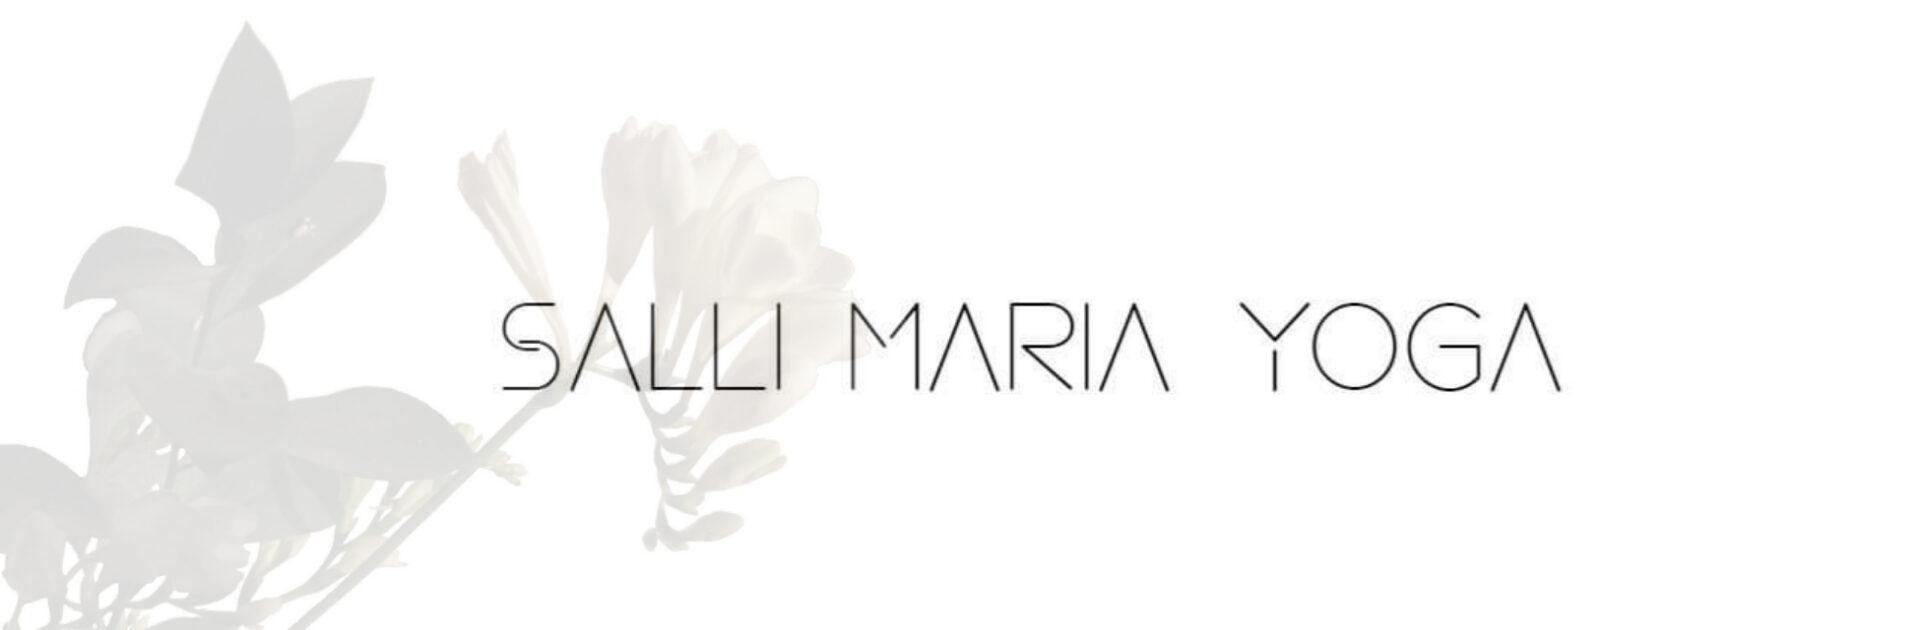 Salli Maria Yoga